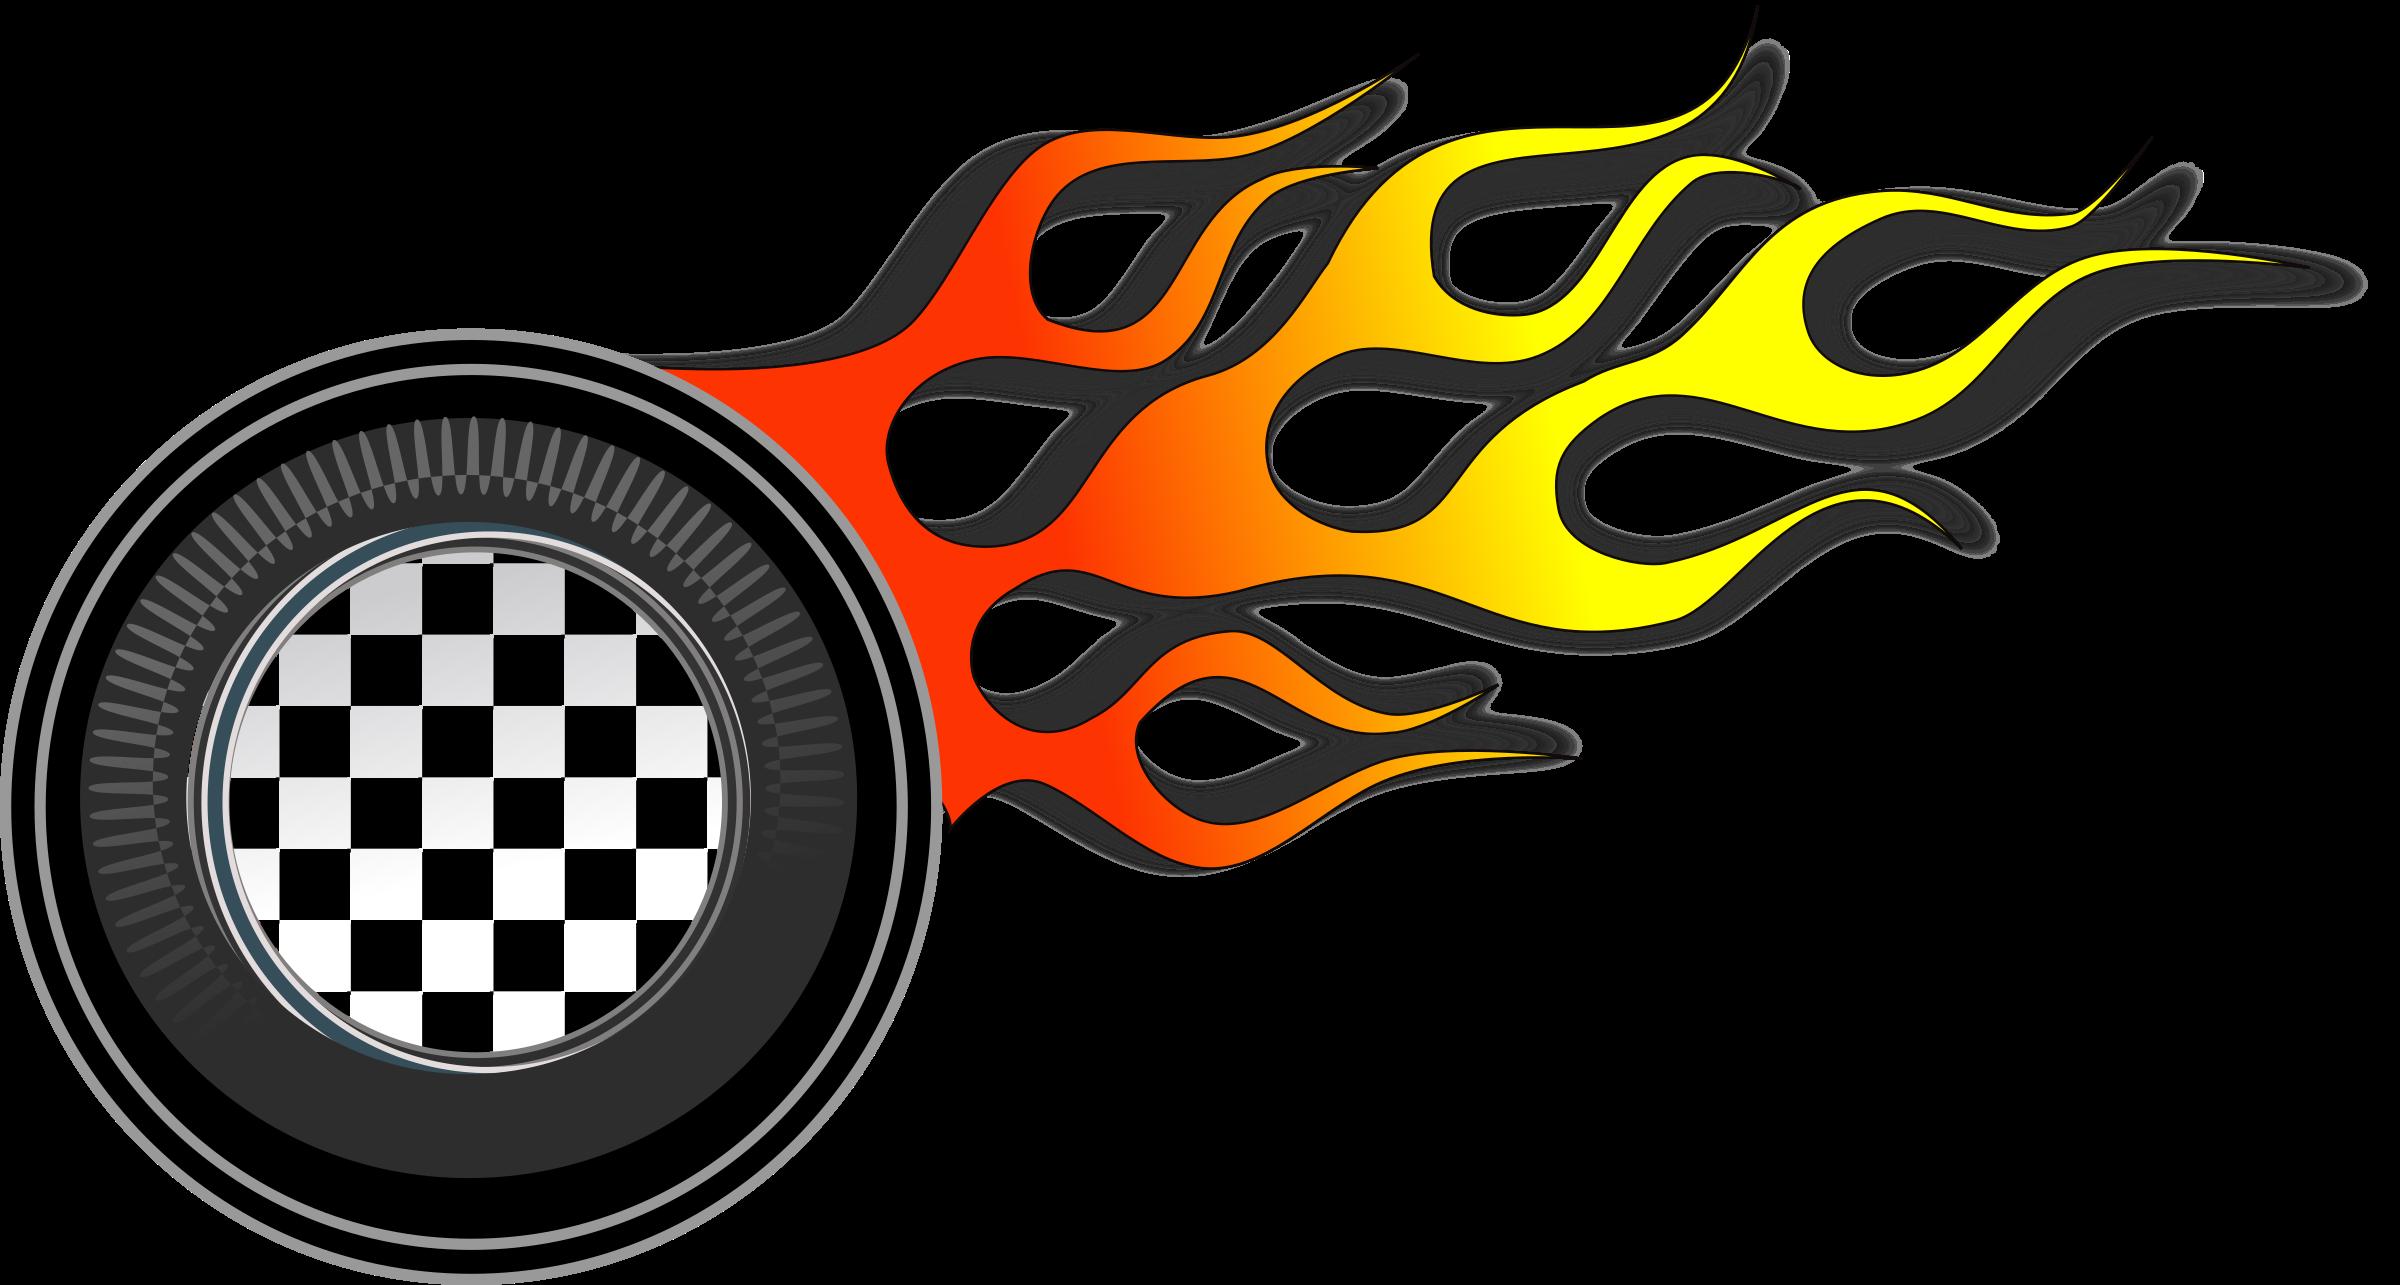 Wheel big image png. Clipart flames racing